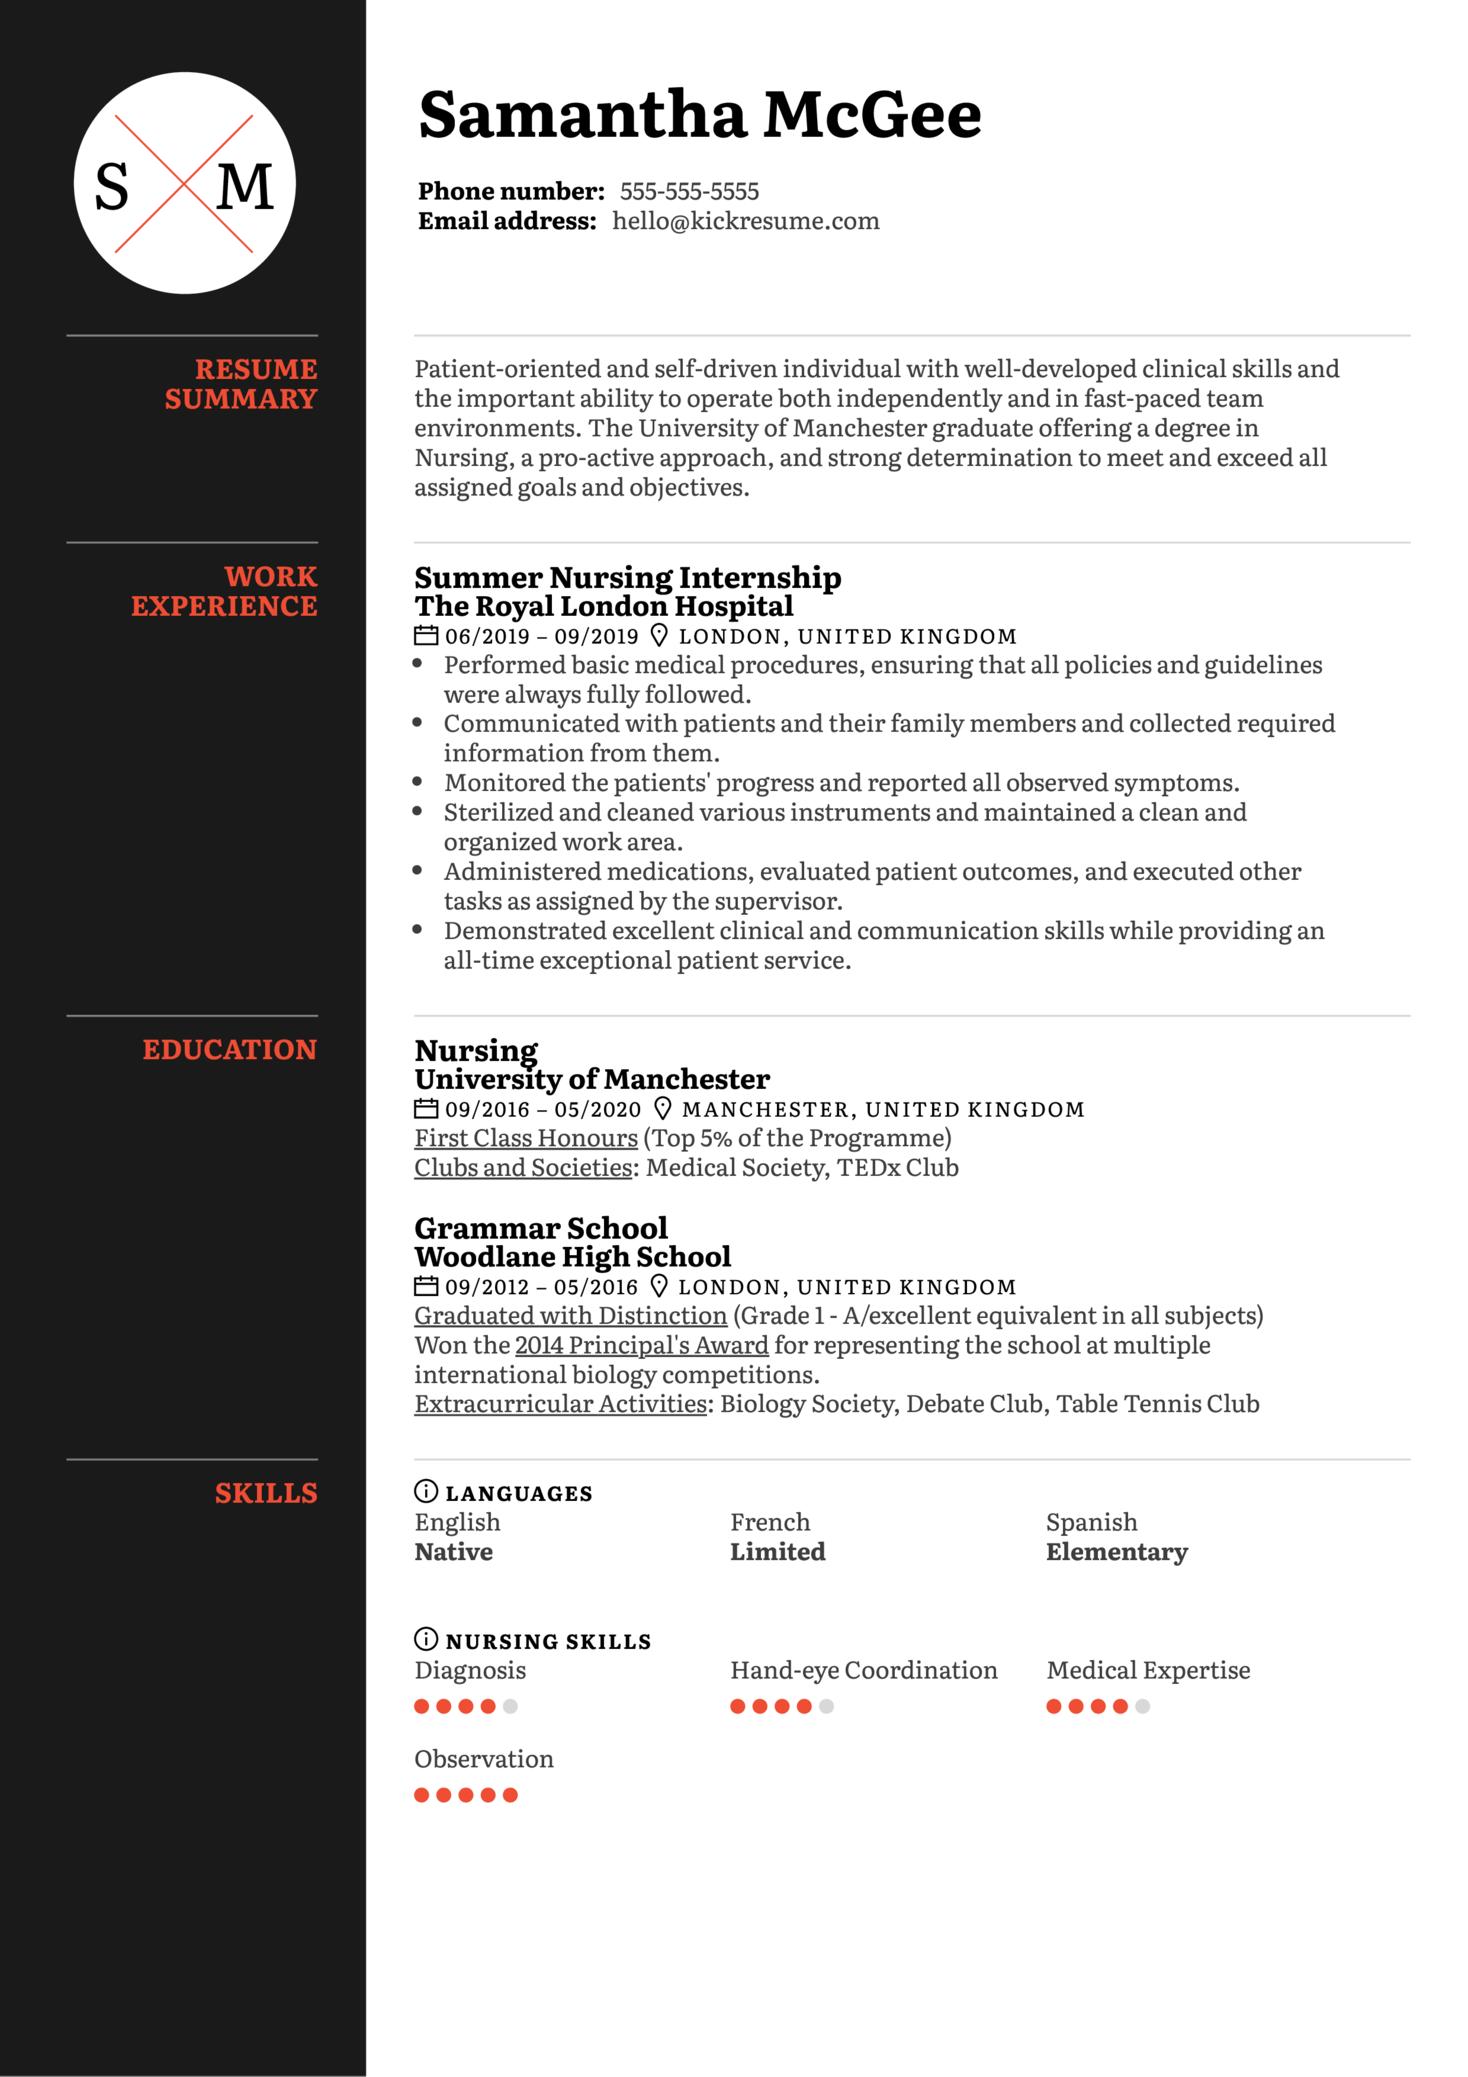 New Grad Nurse Resume Template (Part 1)